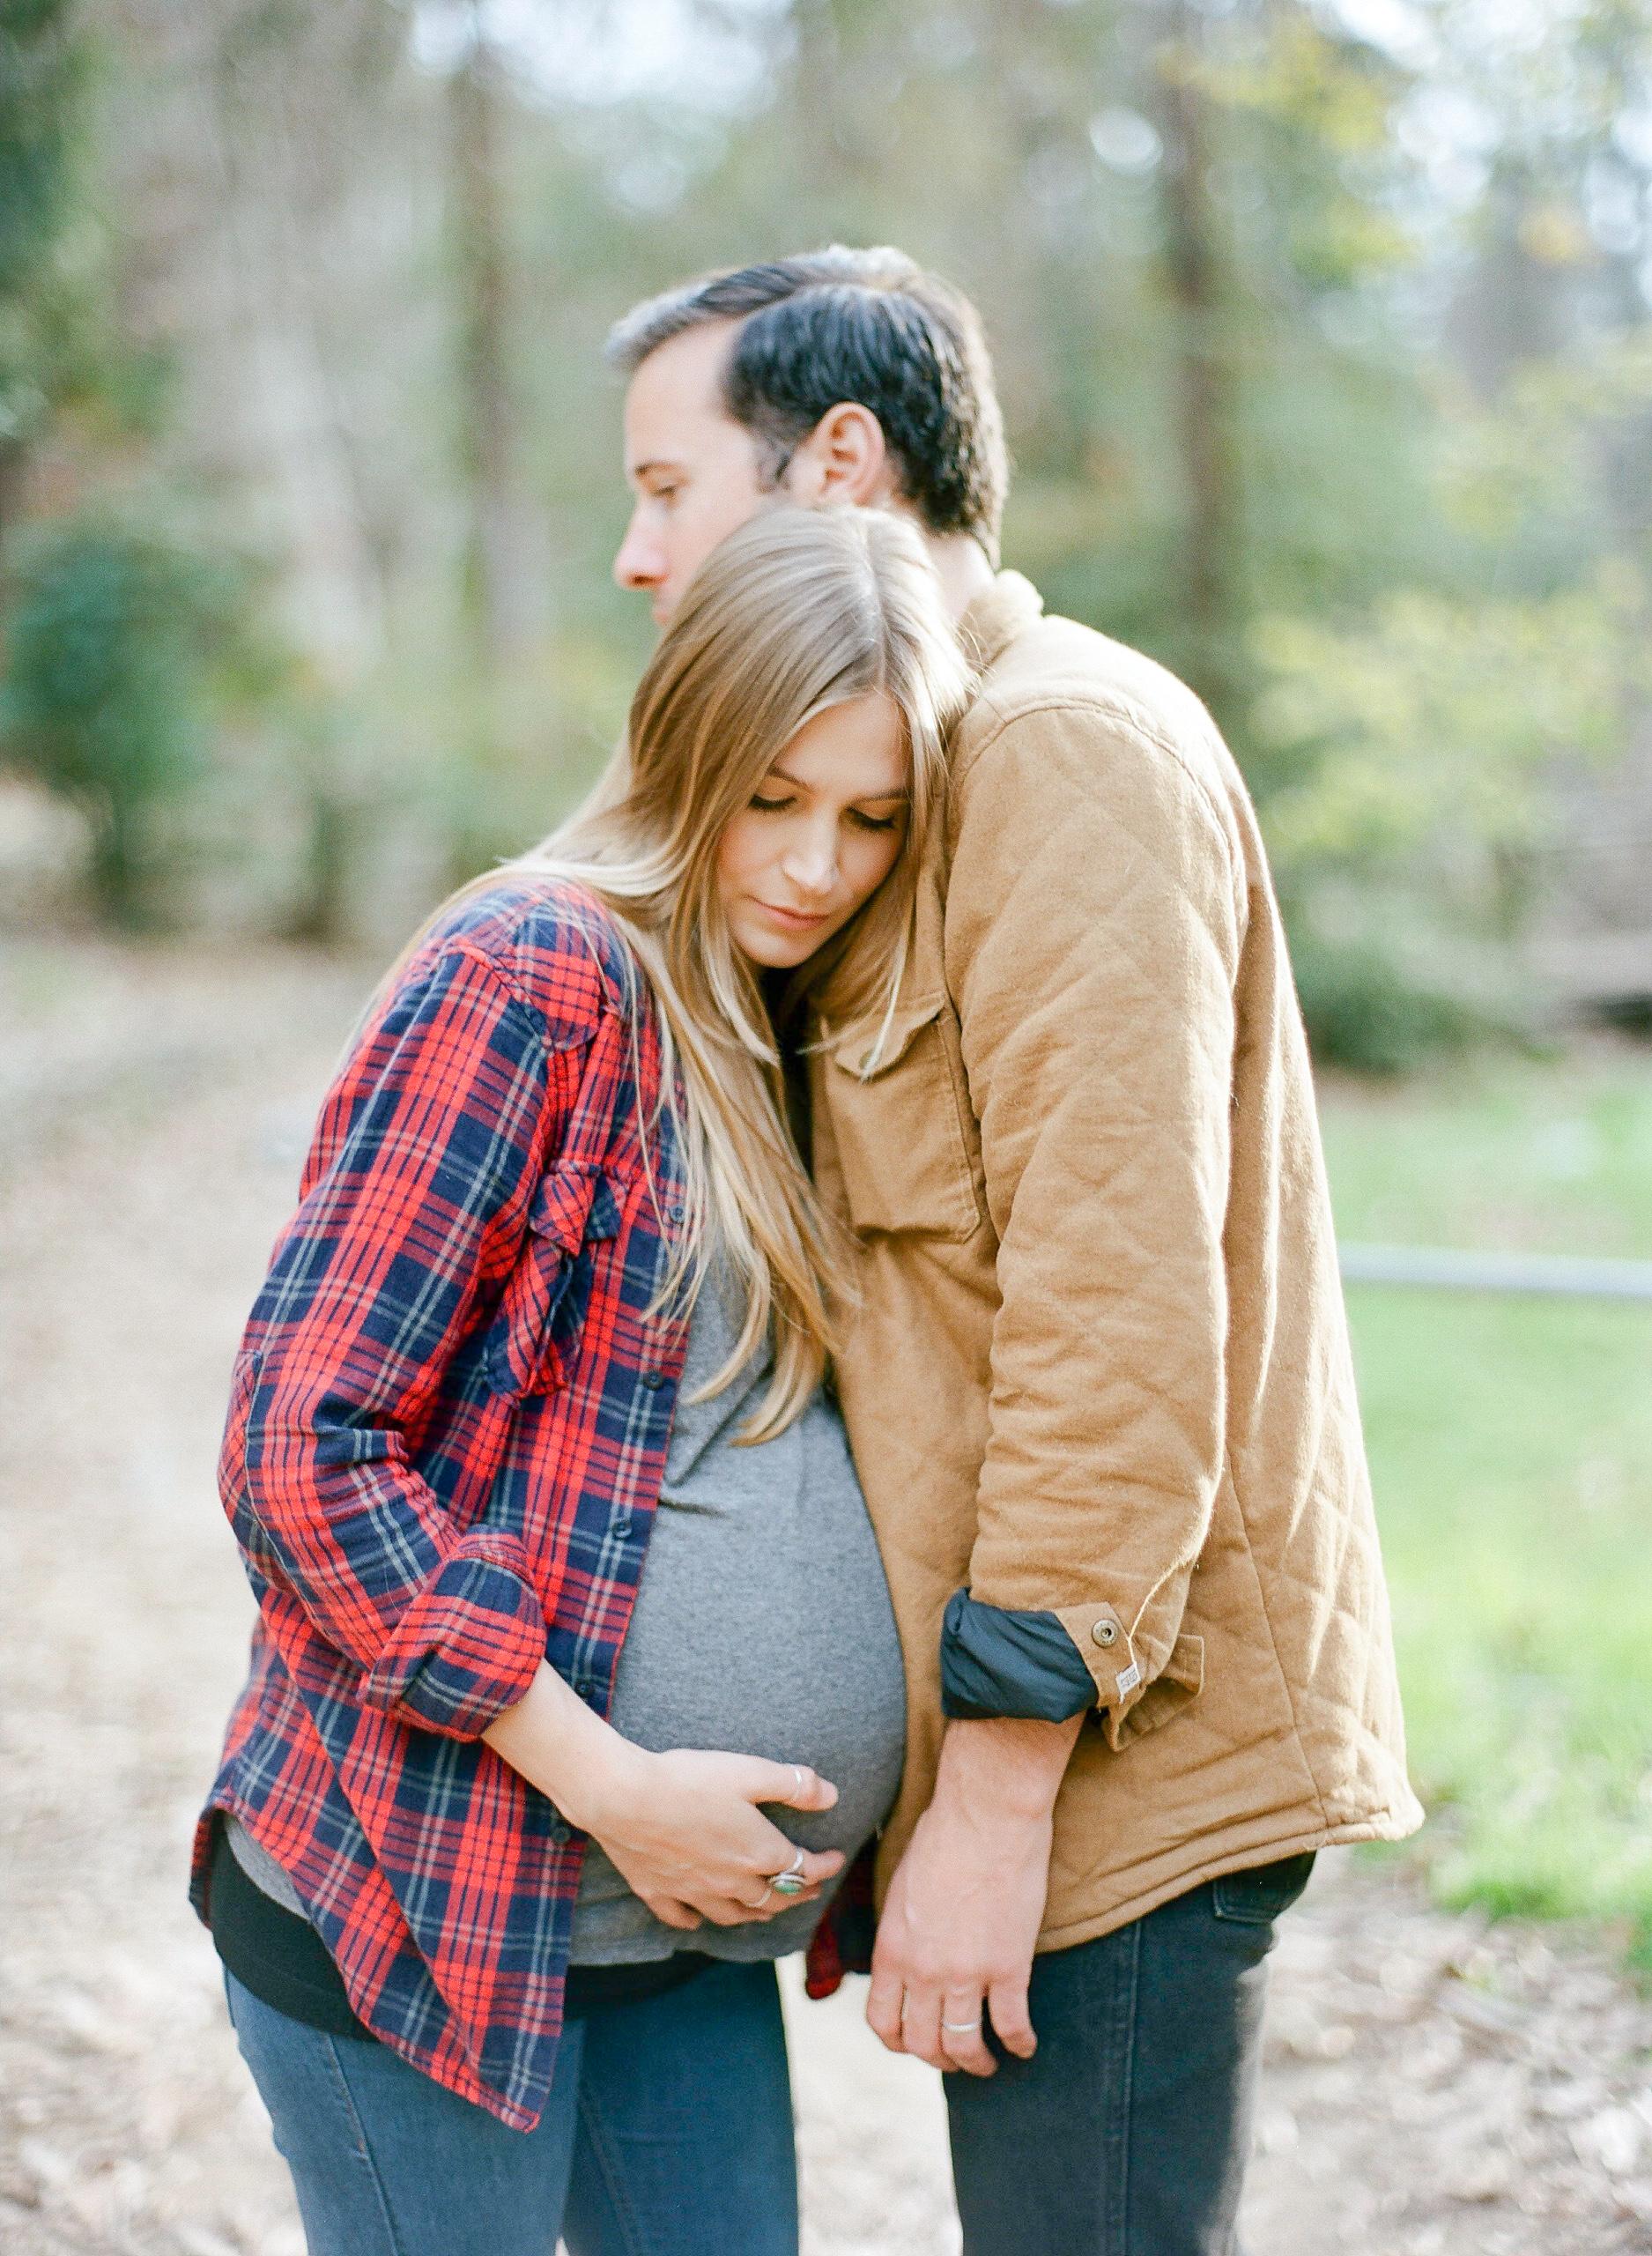 Chrissy & David Maternity Session-7.jpg